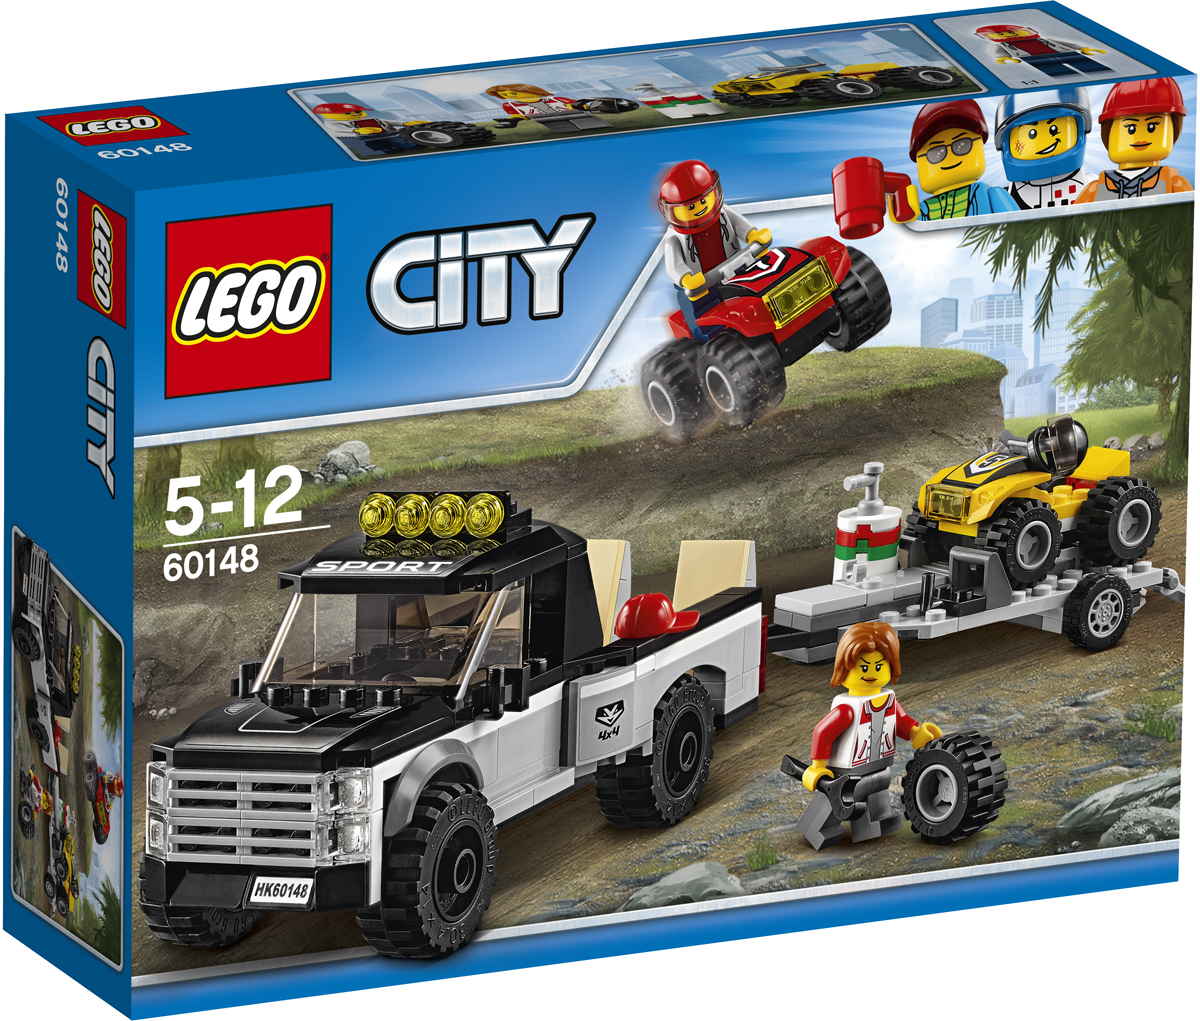 LEGO City Конструктор Гоночная команда 60148 квадроциклы